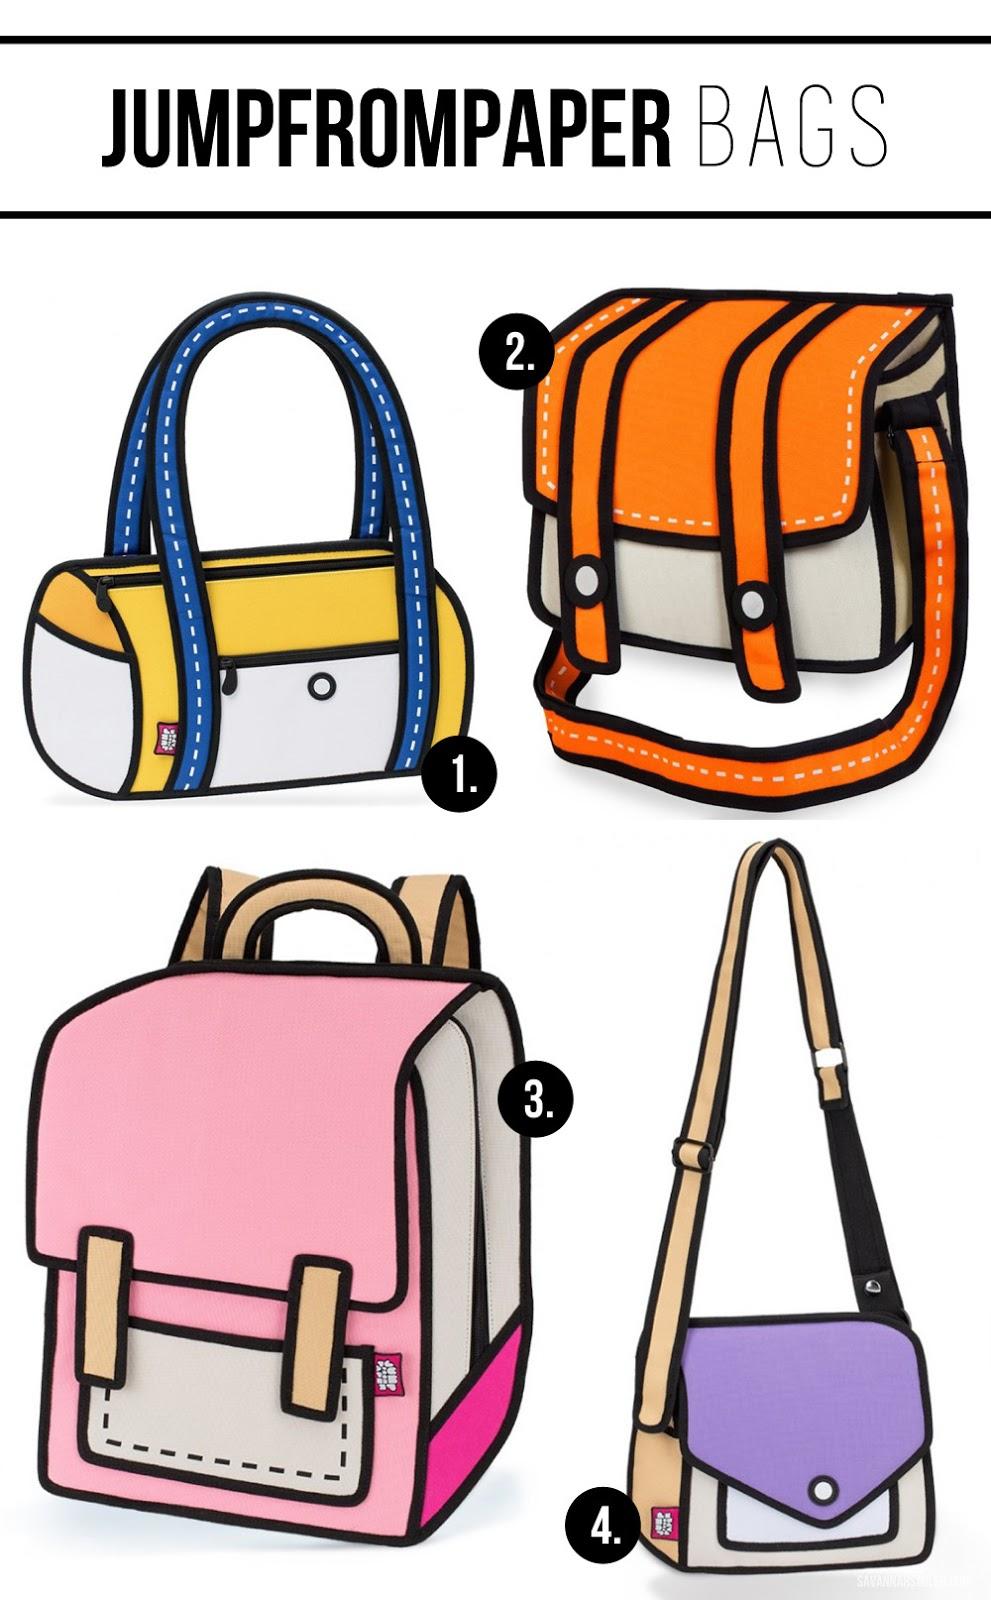 cartoon-purse-bags-jump-from-paper%2Bcopy.jpg